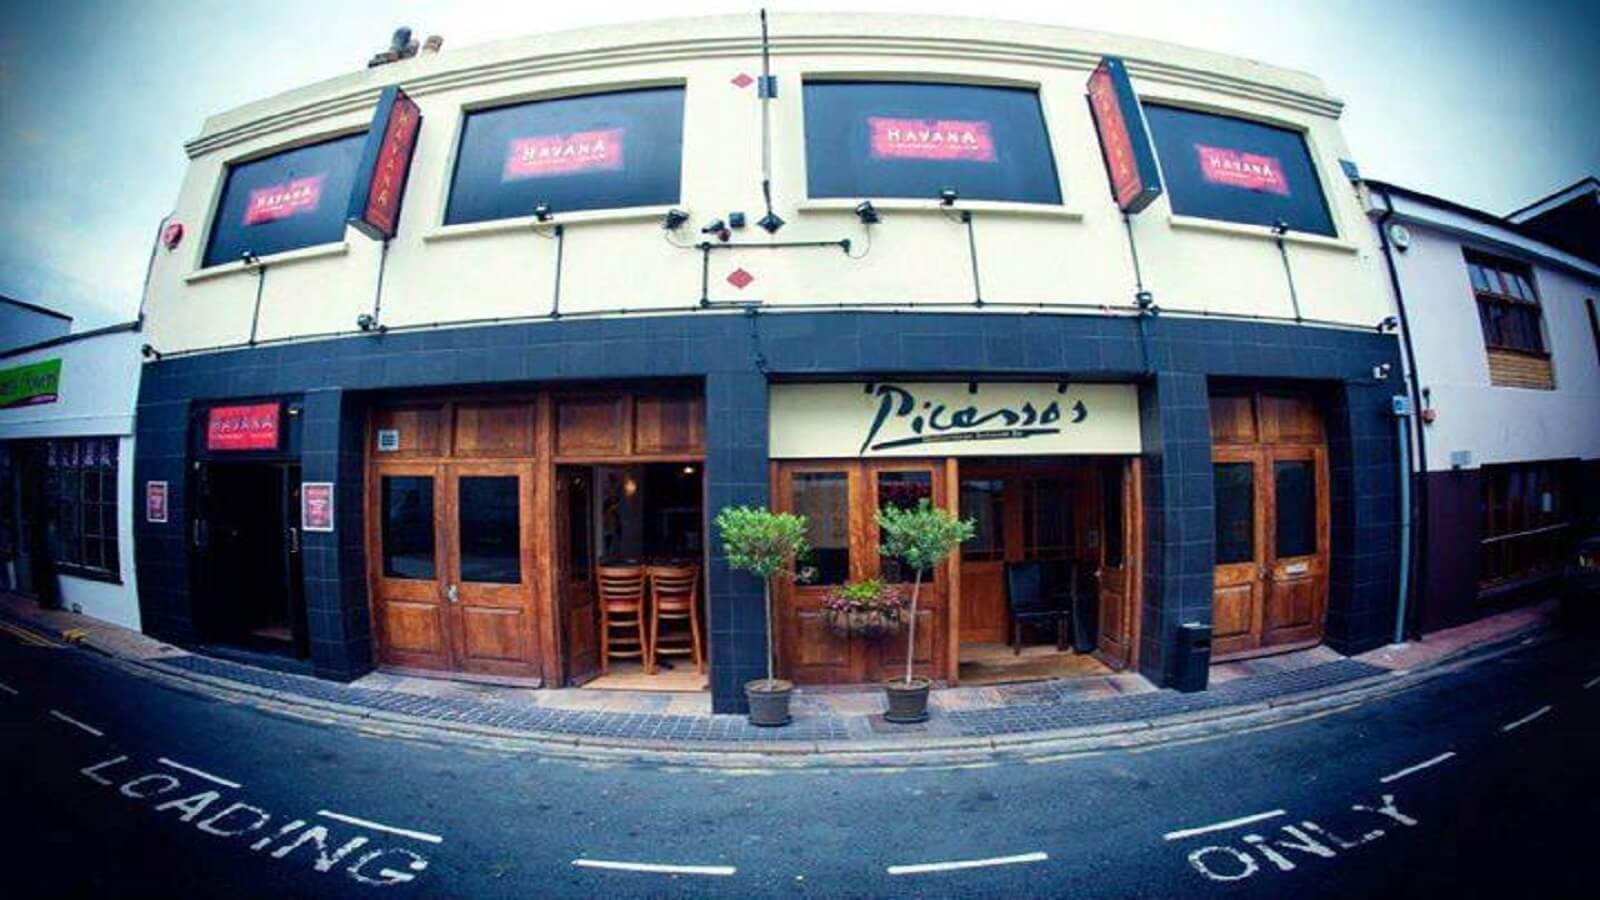 Picasso's Restaurant